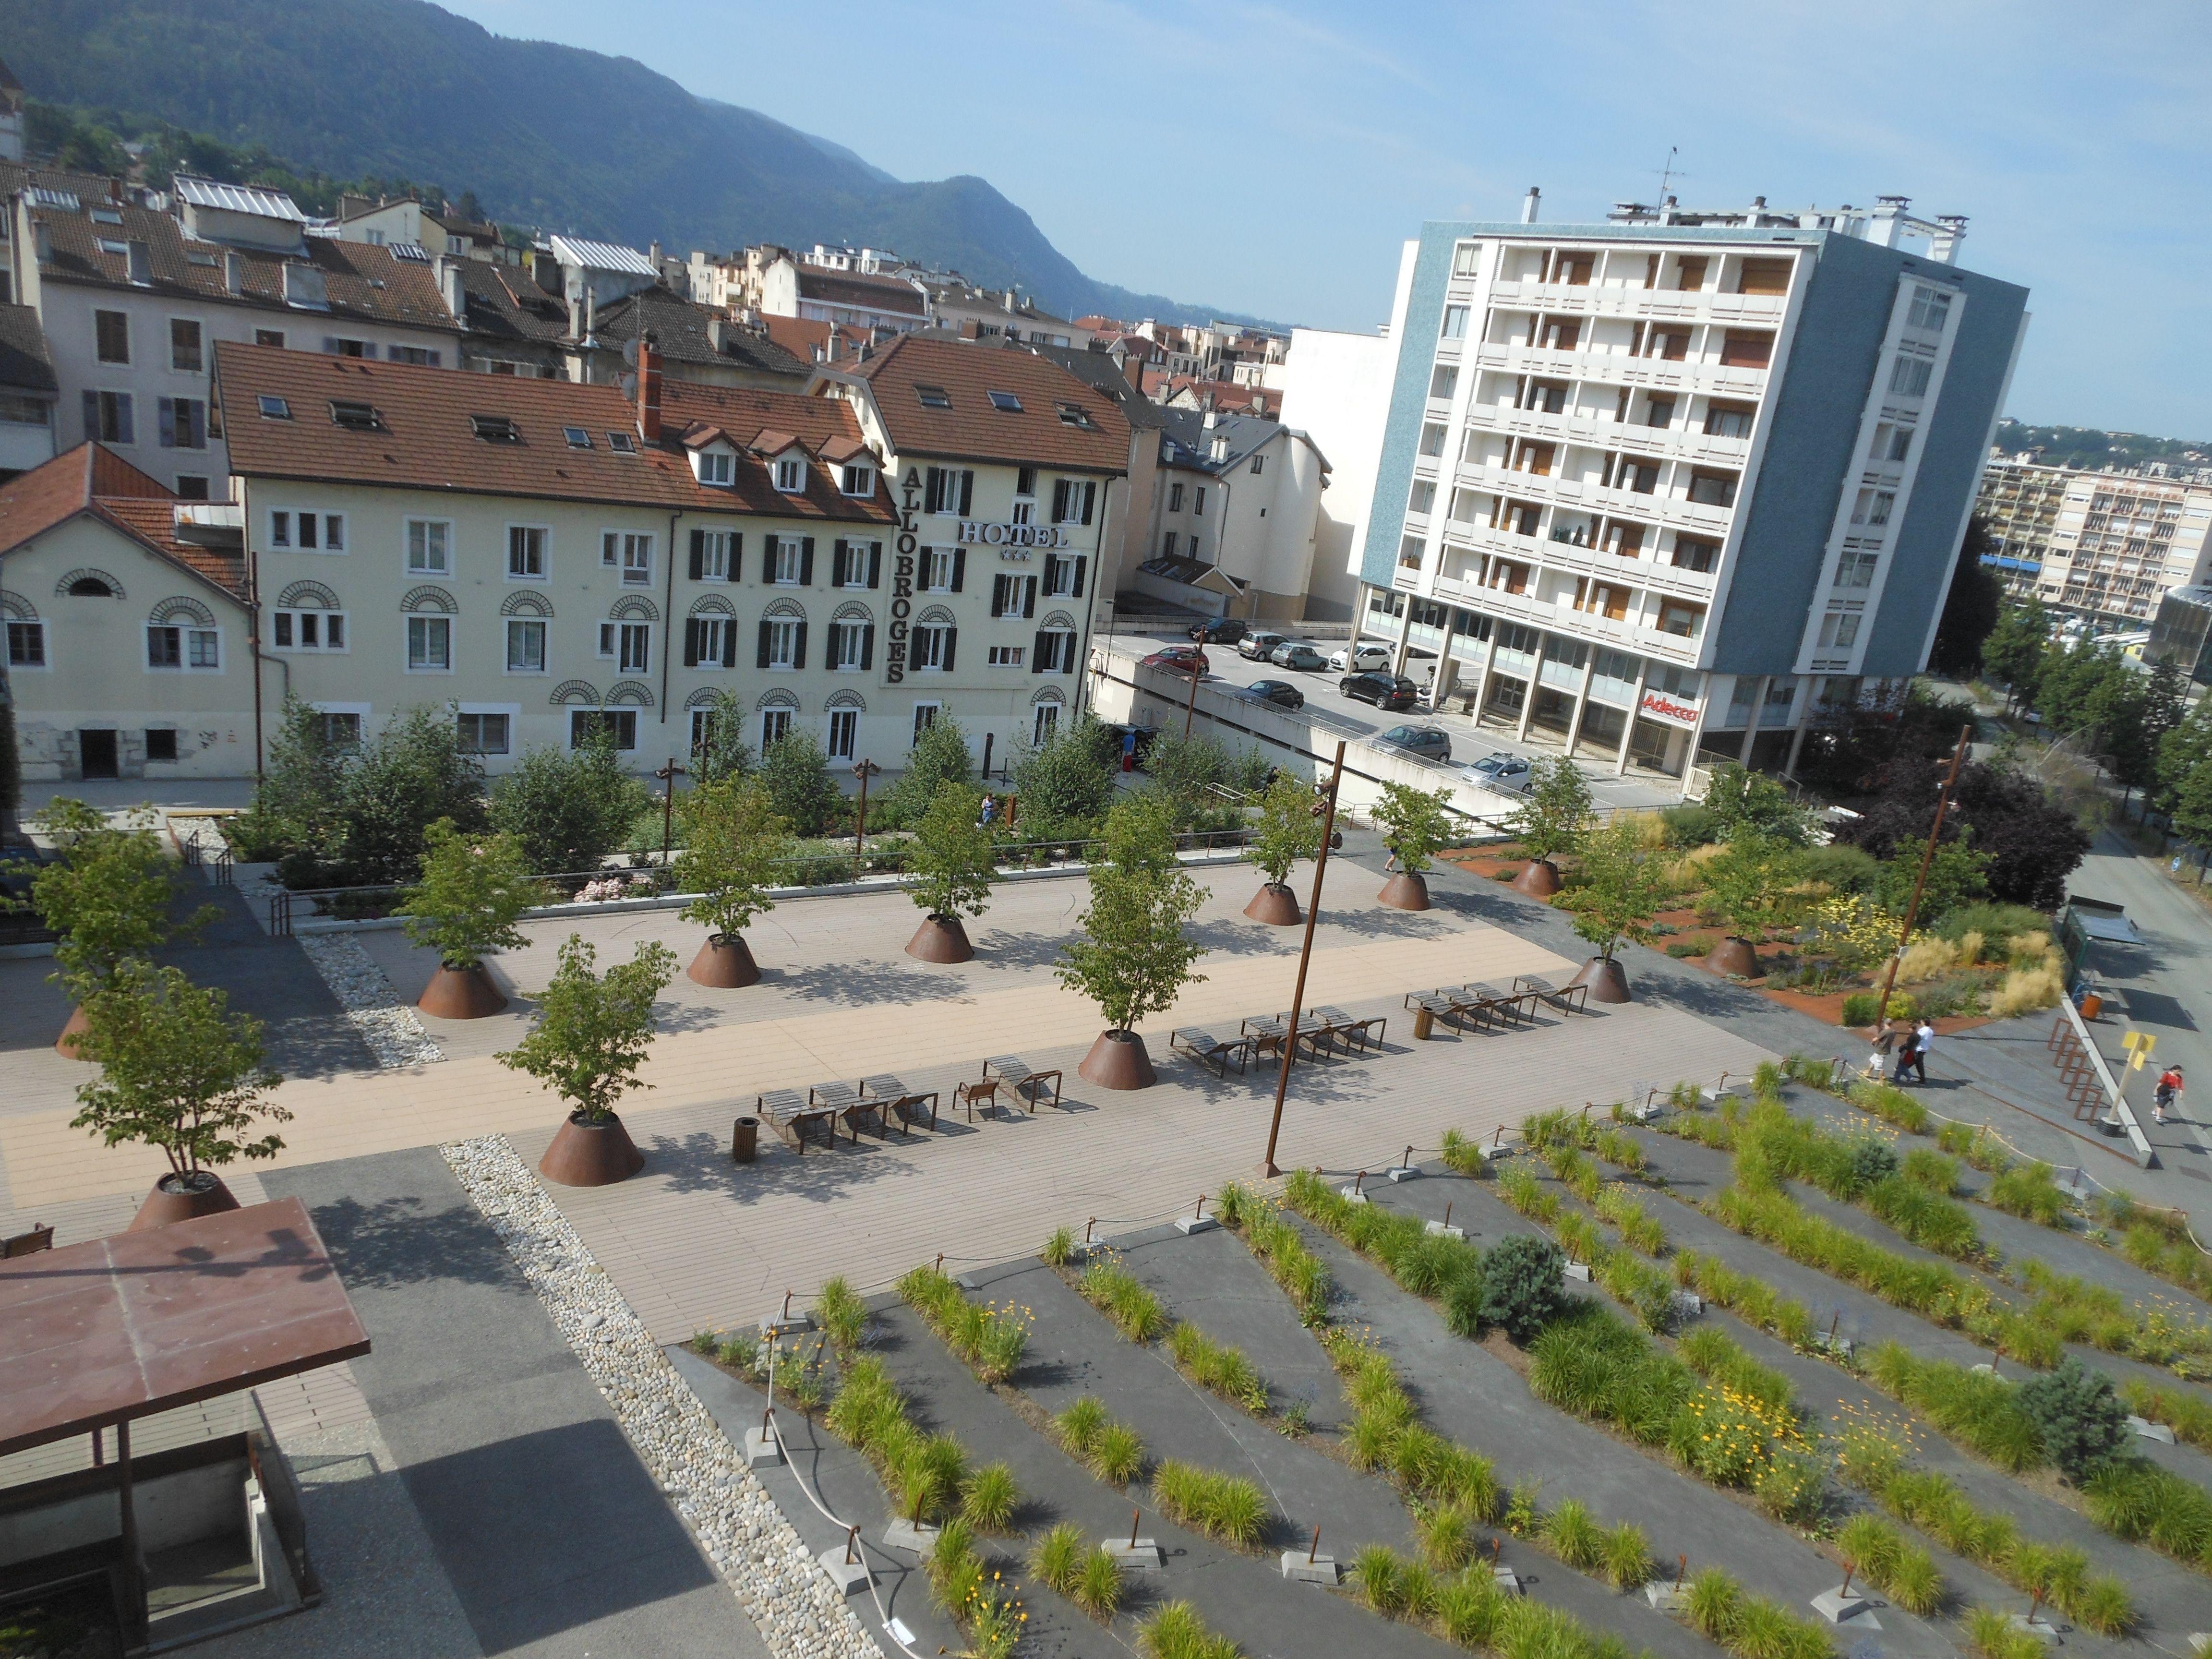 Collectivit s espace public urbain bronze mairie d for Jardin urbain